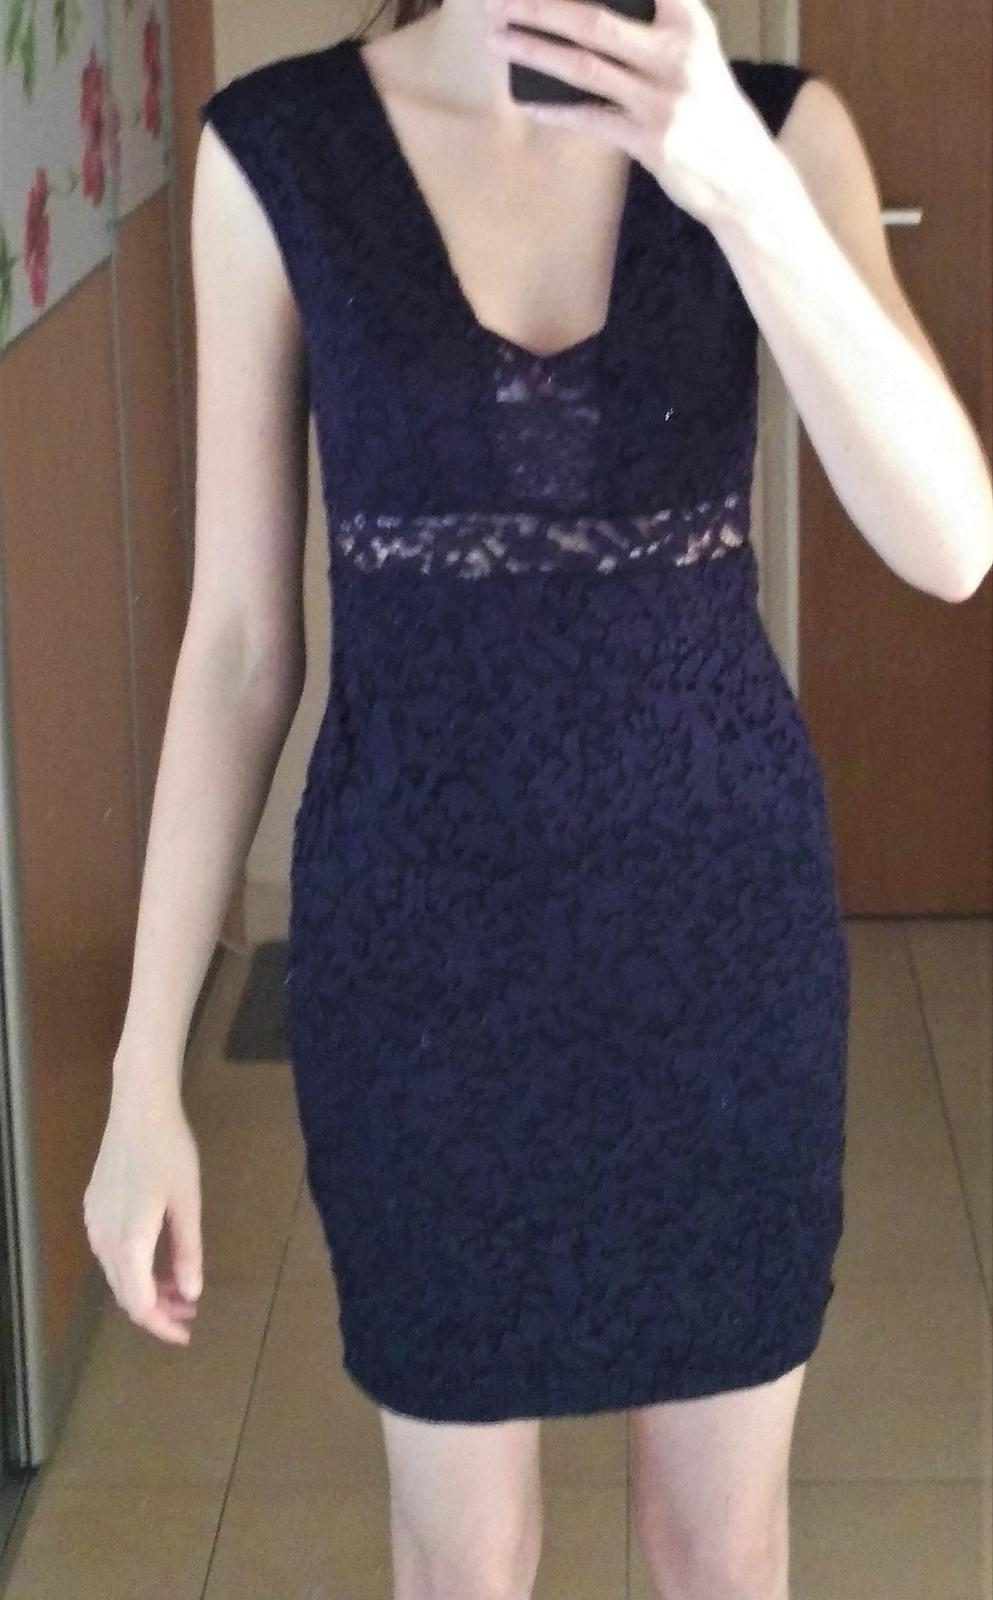 Tmavomodré sexi čipkované šaty 36/S-38/M - Obrázok č. 1